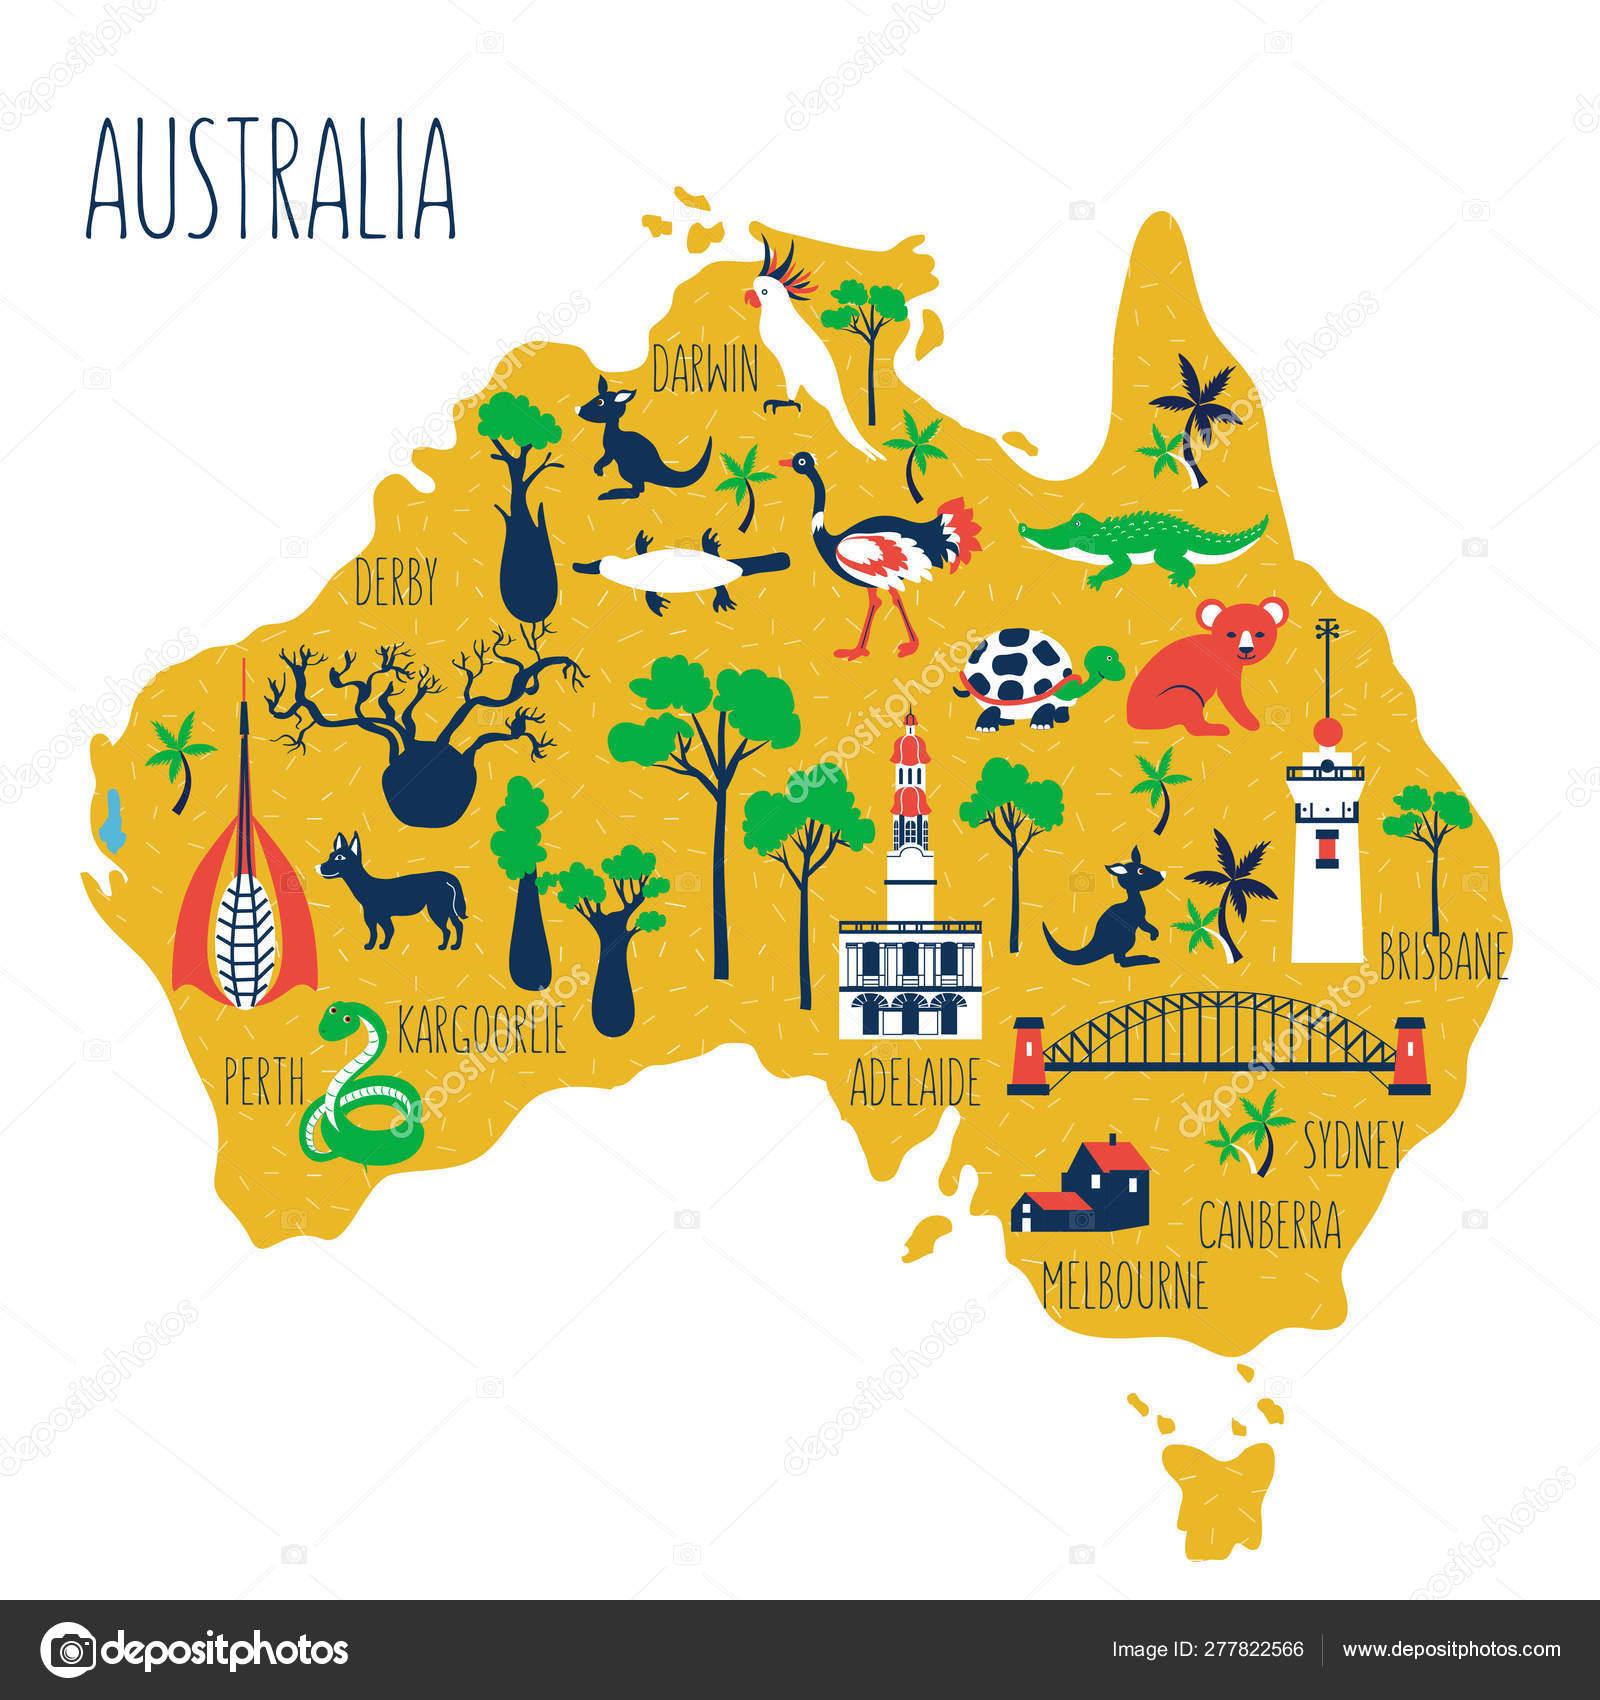 Australia cartoon travel map vector illustration, landmark ...